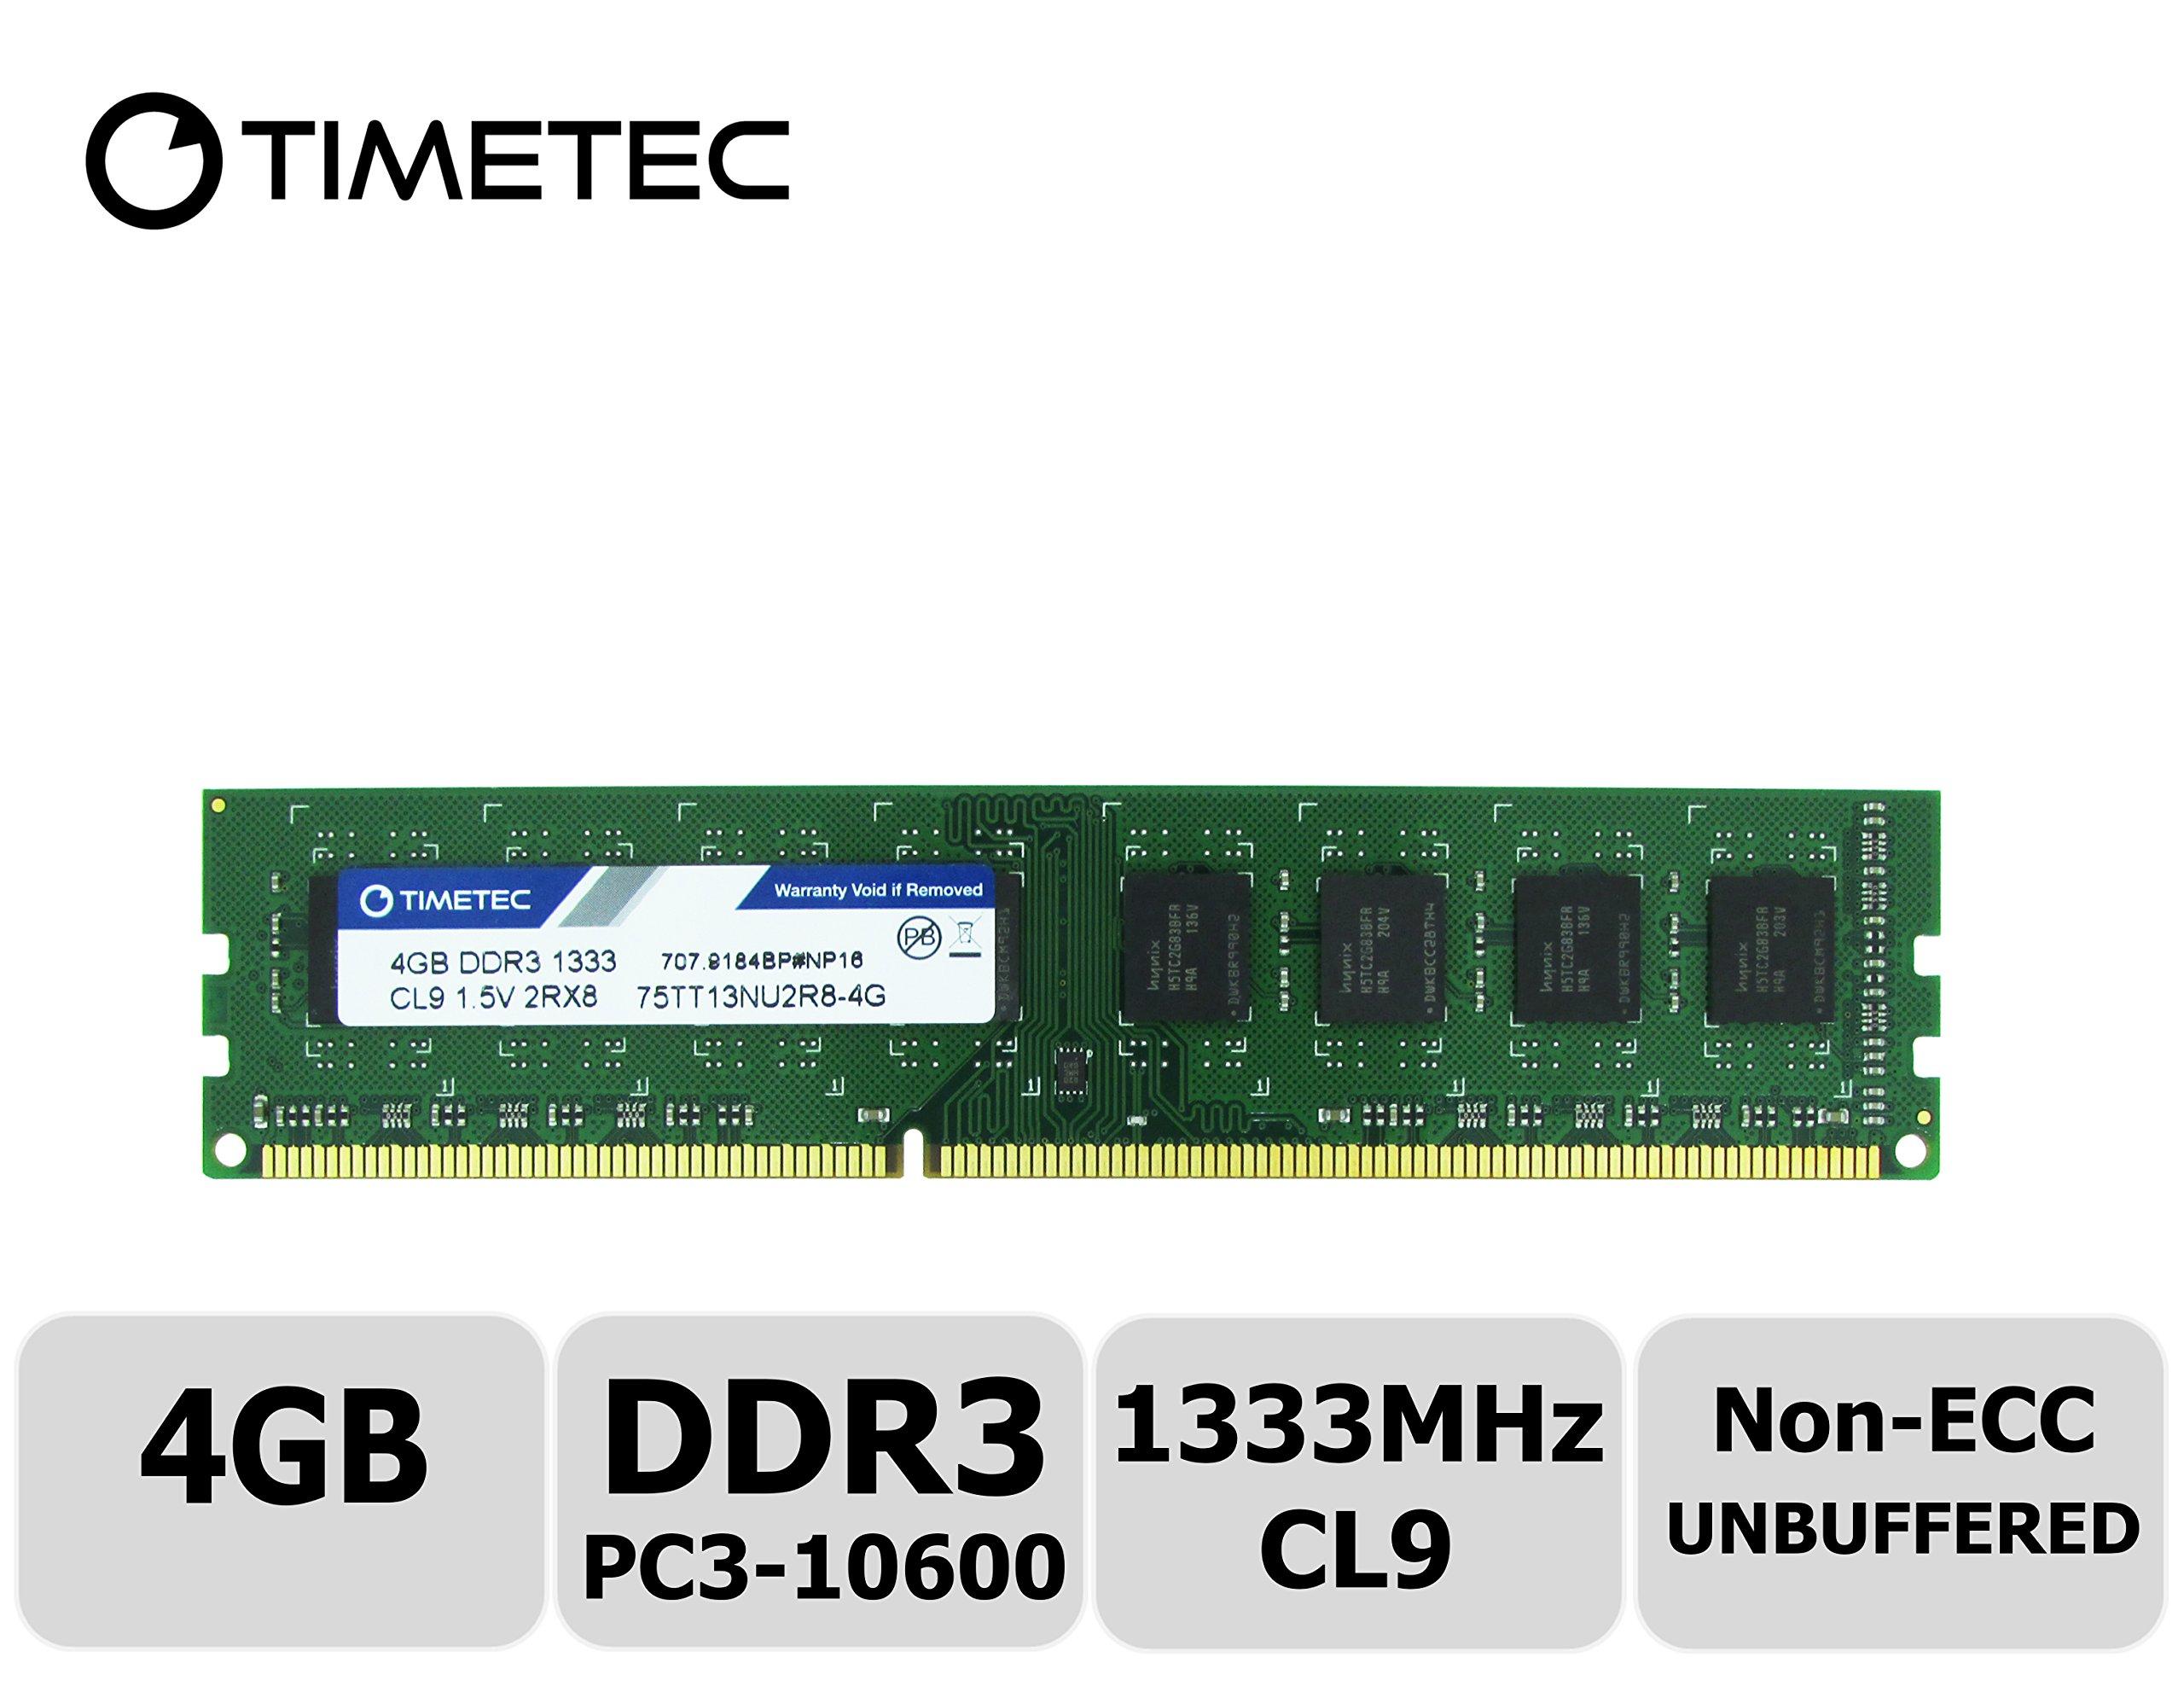 Timetec-Hynix-IC-DDR3-1333MHz-PC3-10600-Unbuffered-Non-ECC-15V-CL9-2Rx8-Dual-Rank-240-Pin-UDIMM-Desktop-Memory-Ram-Module-Upgrade